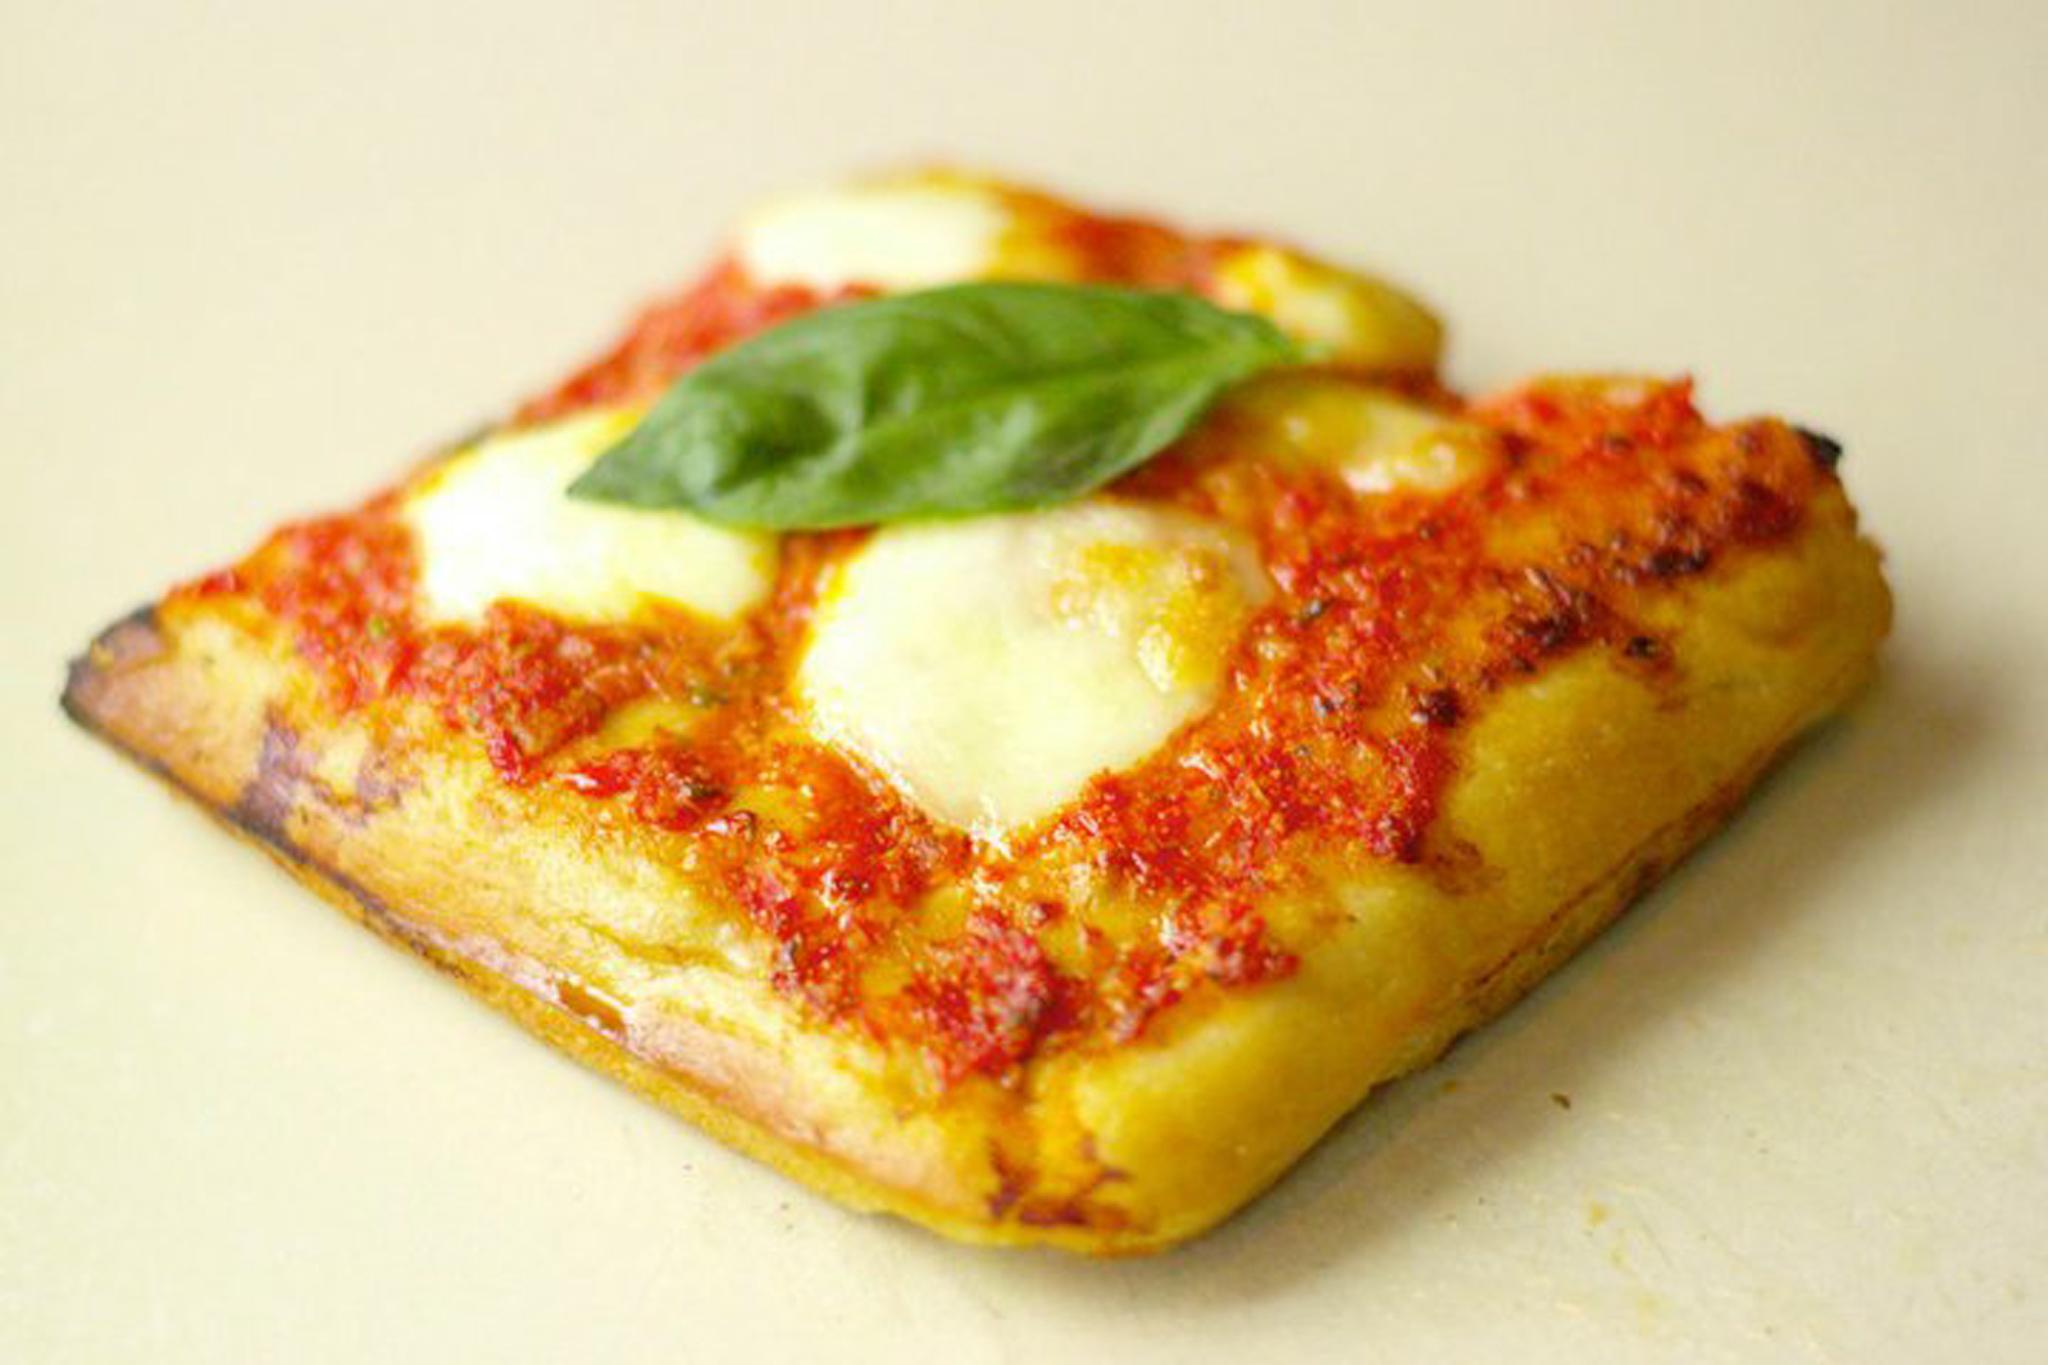 Lil' Frankie's Pizza